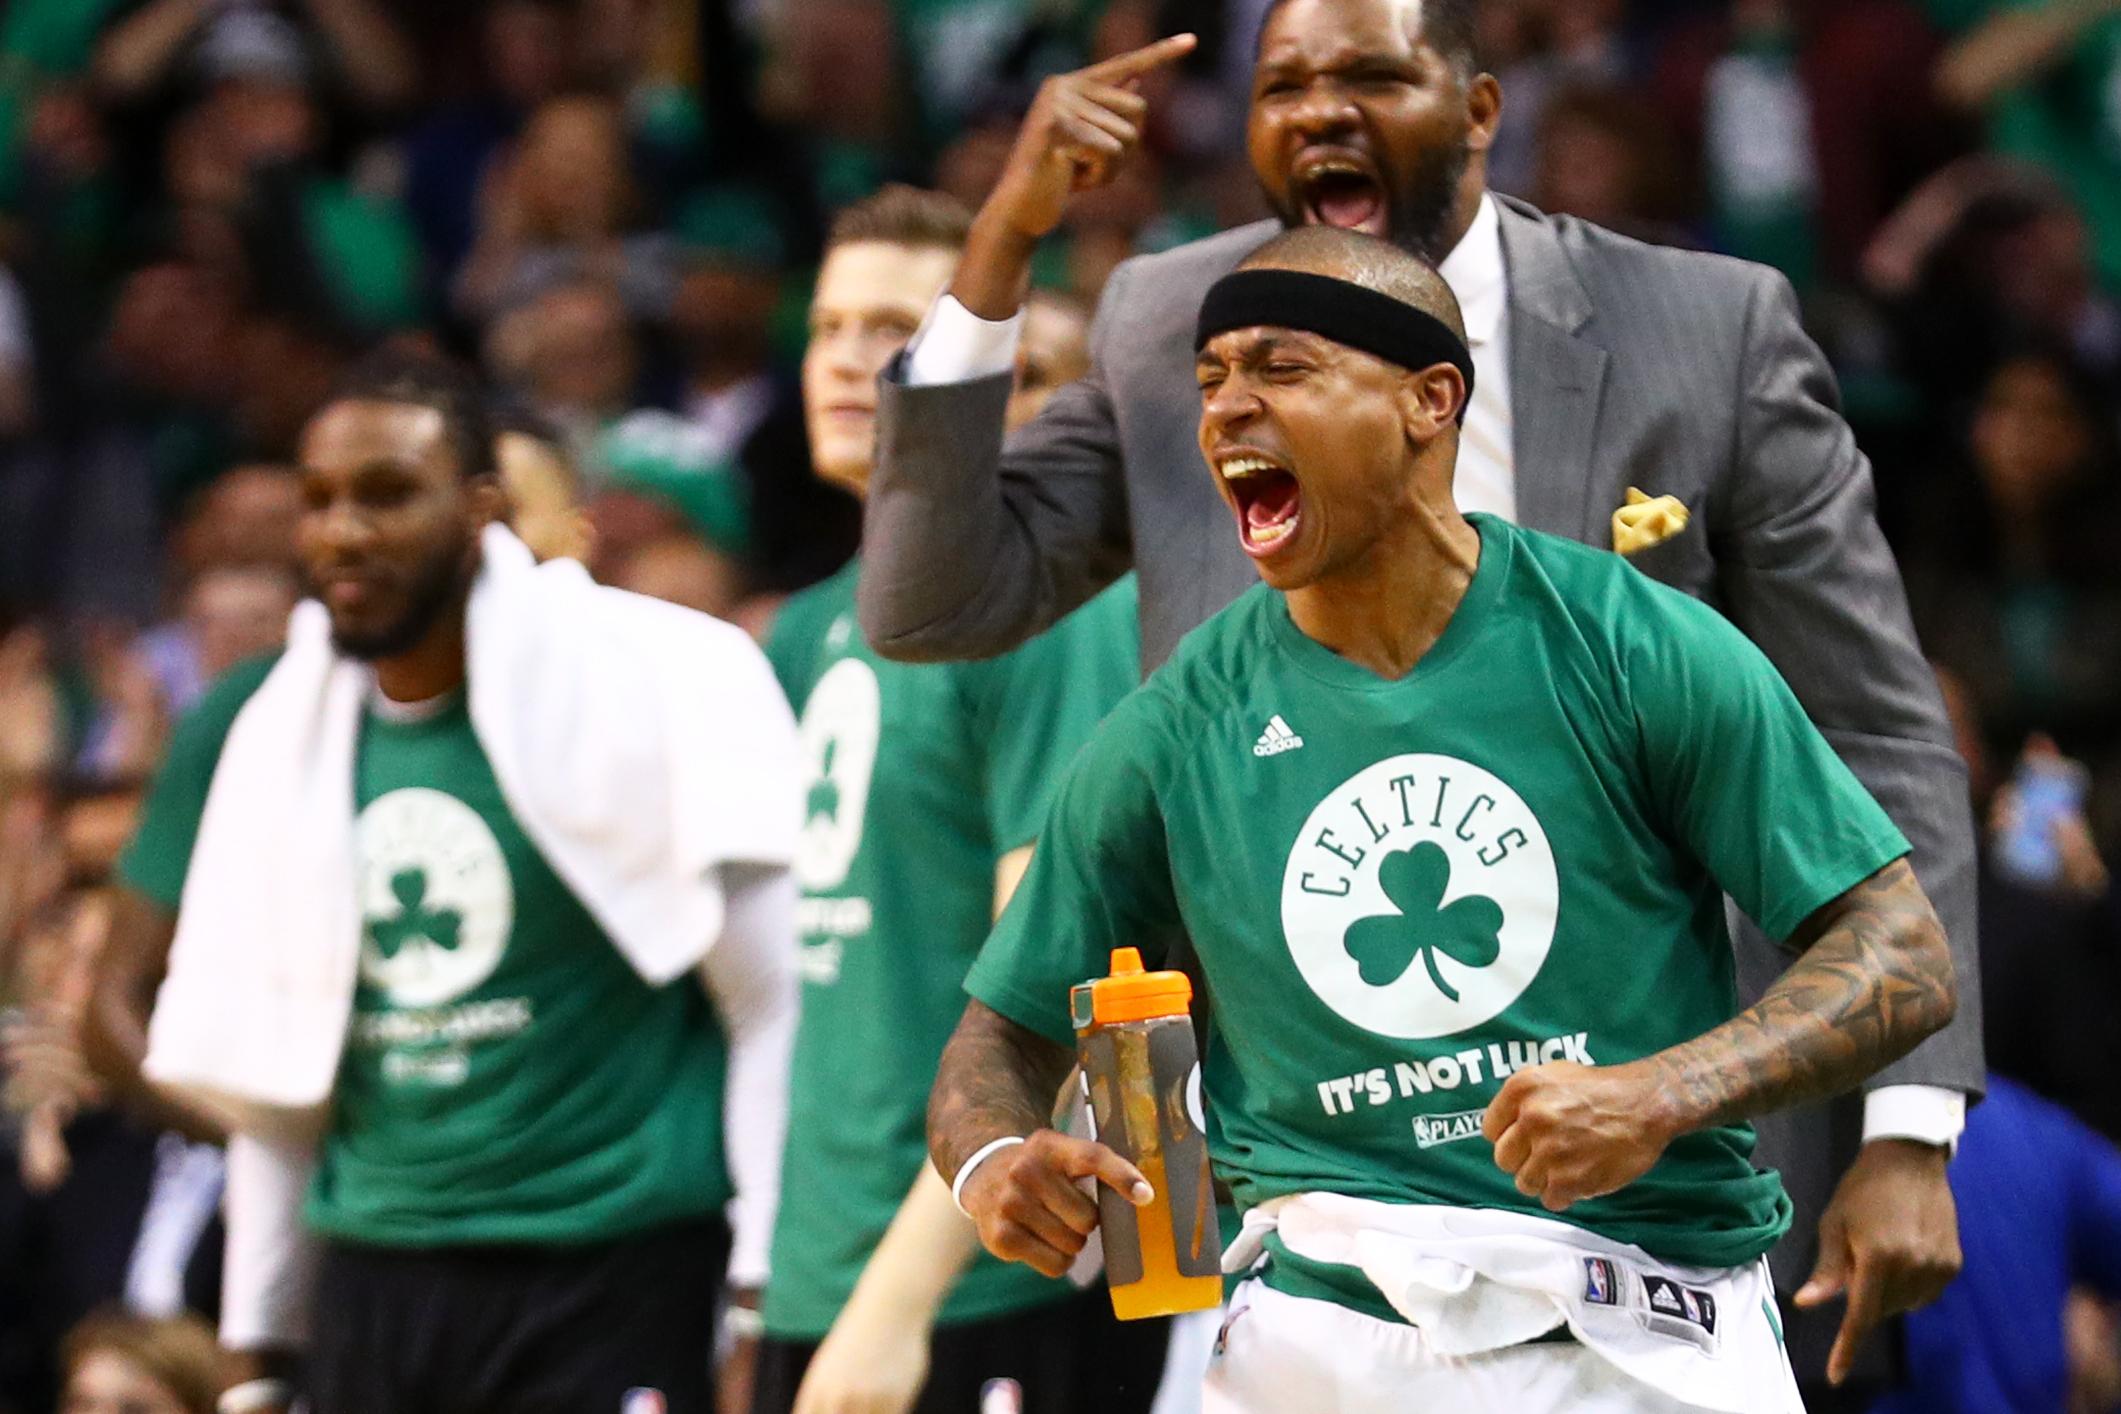 The Boston Celtics should give Isaiah Thomas another shot.